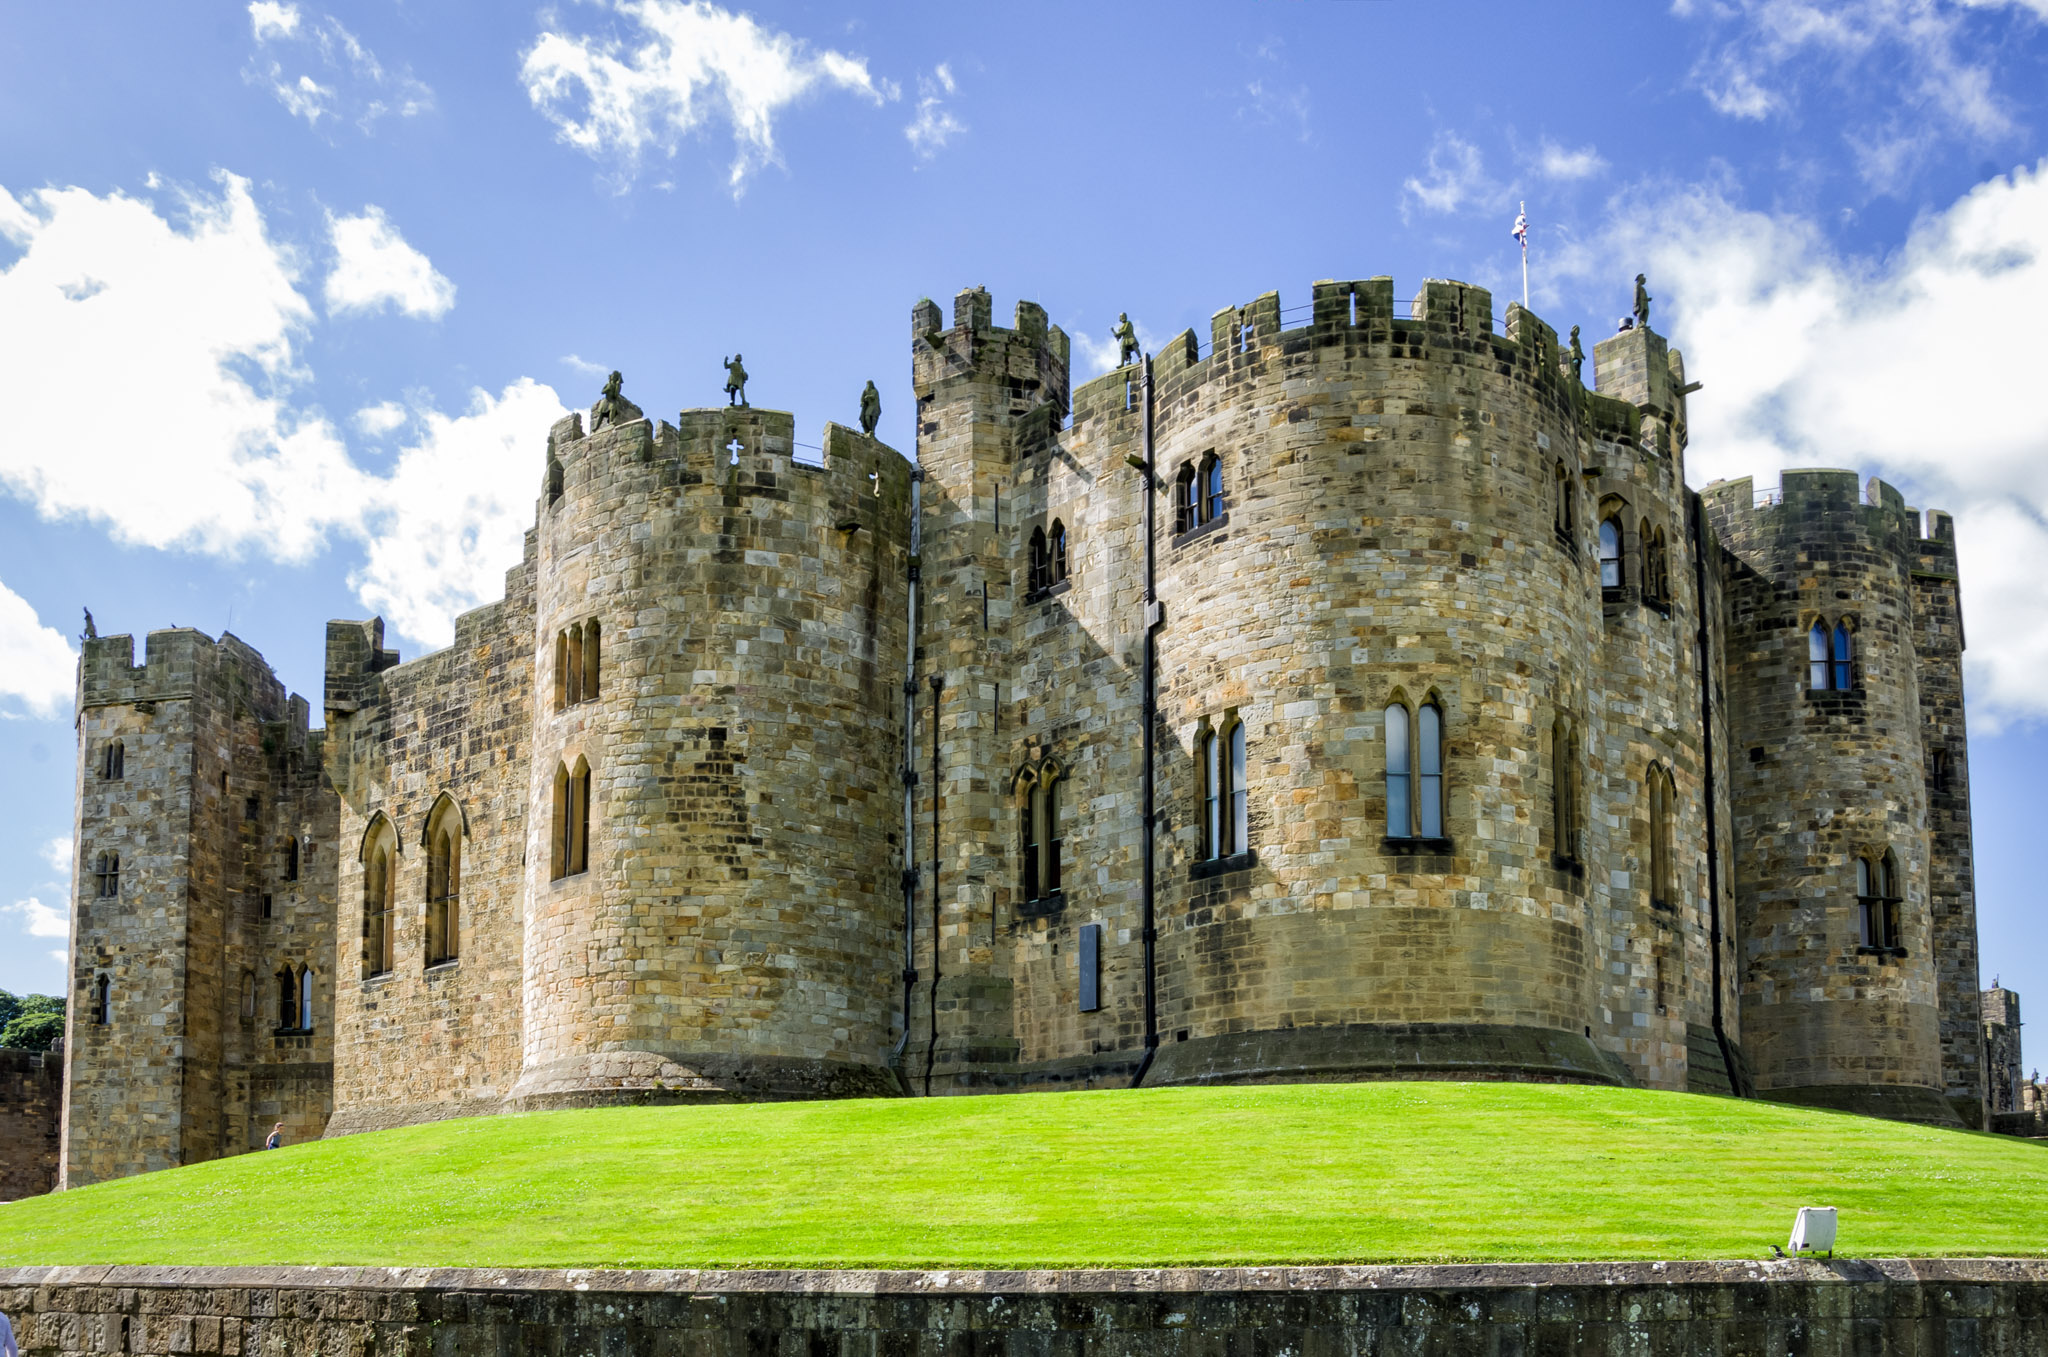 Alnwick Castle, Alnick, England